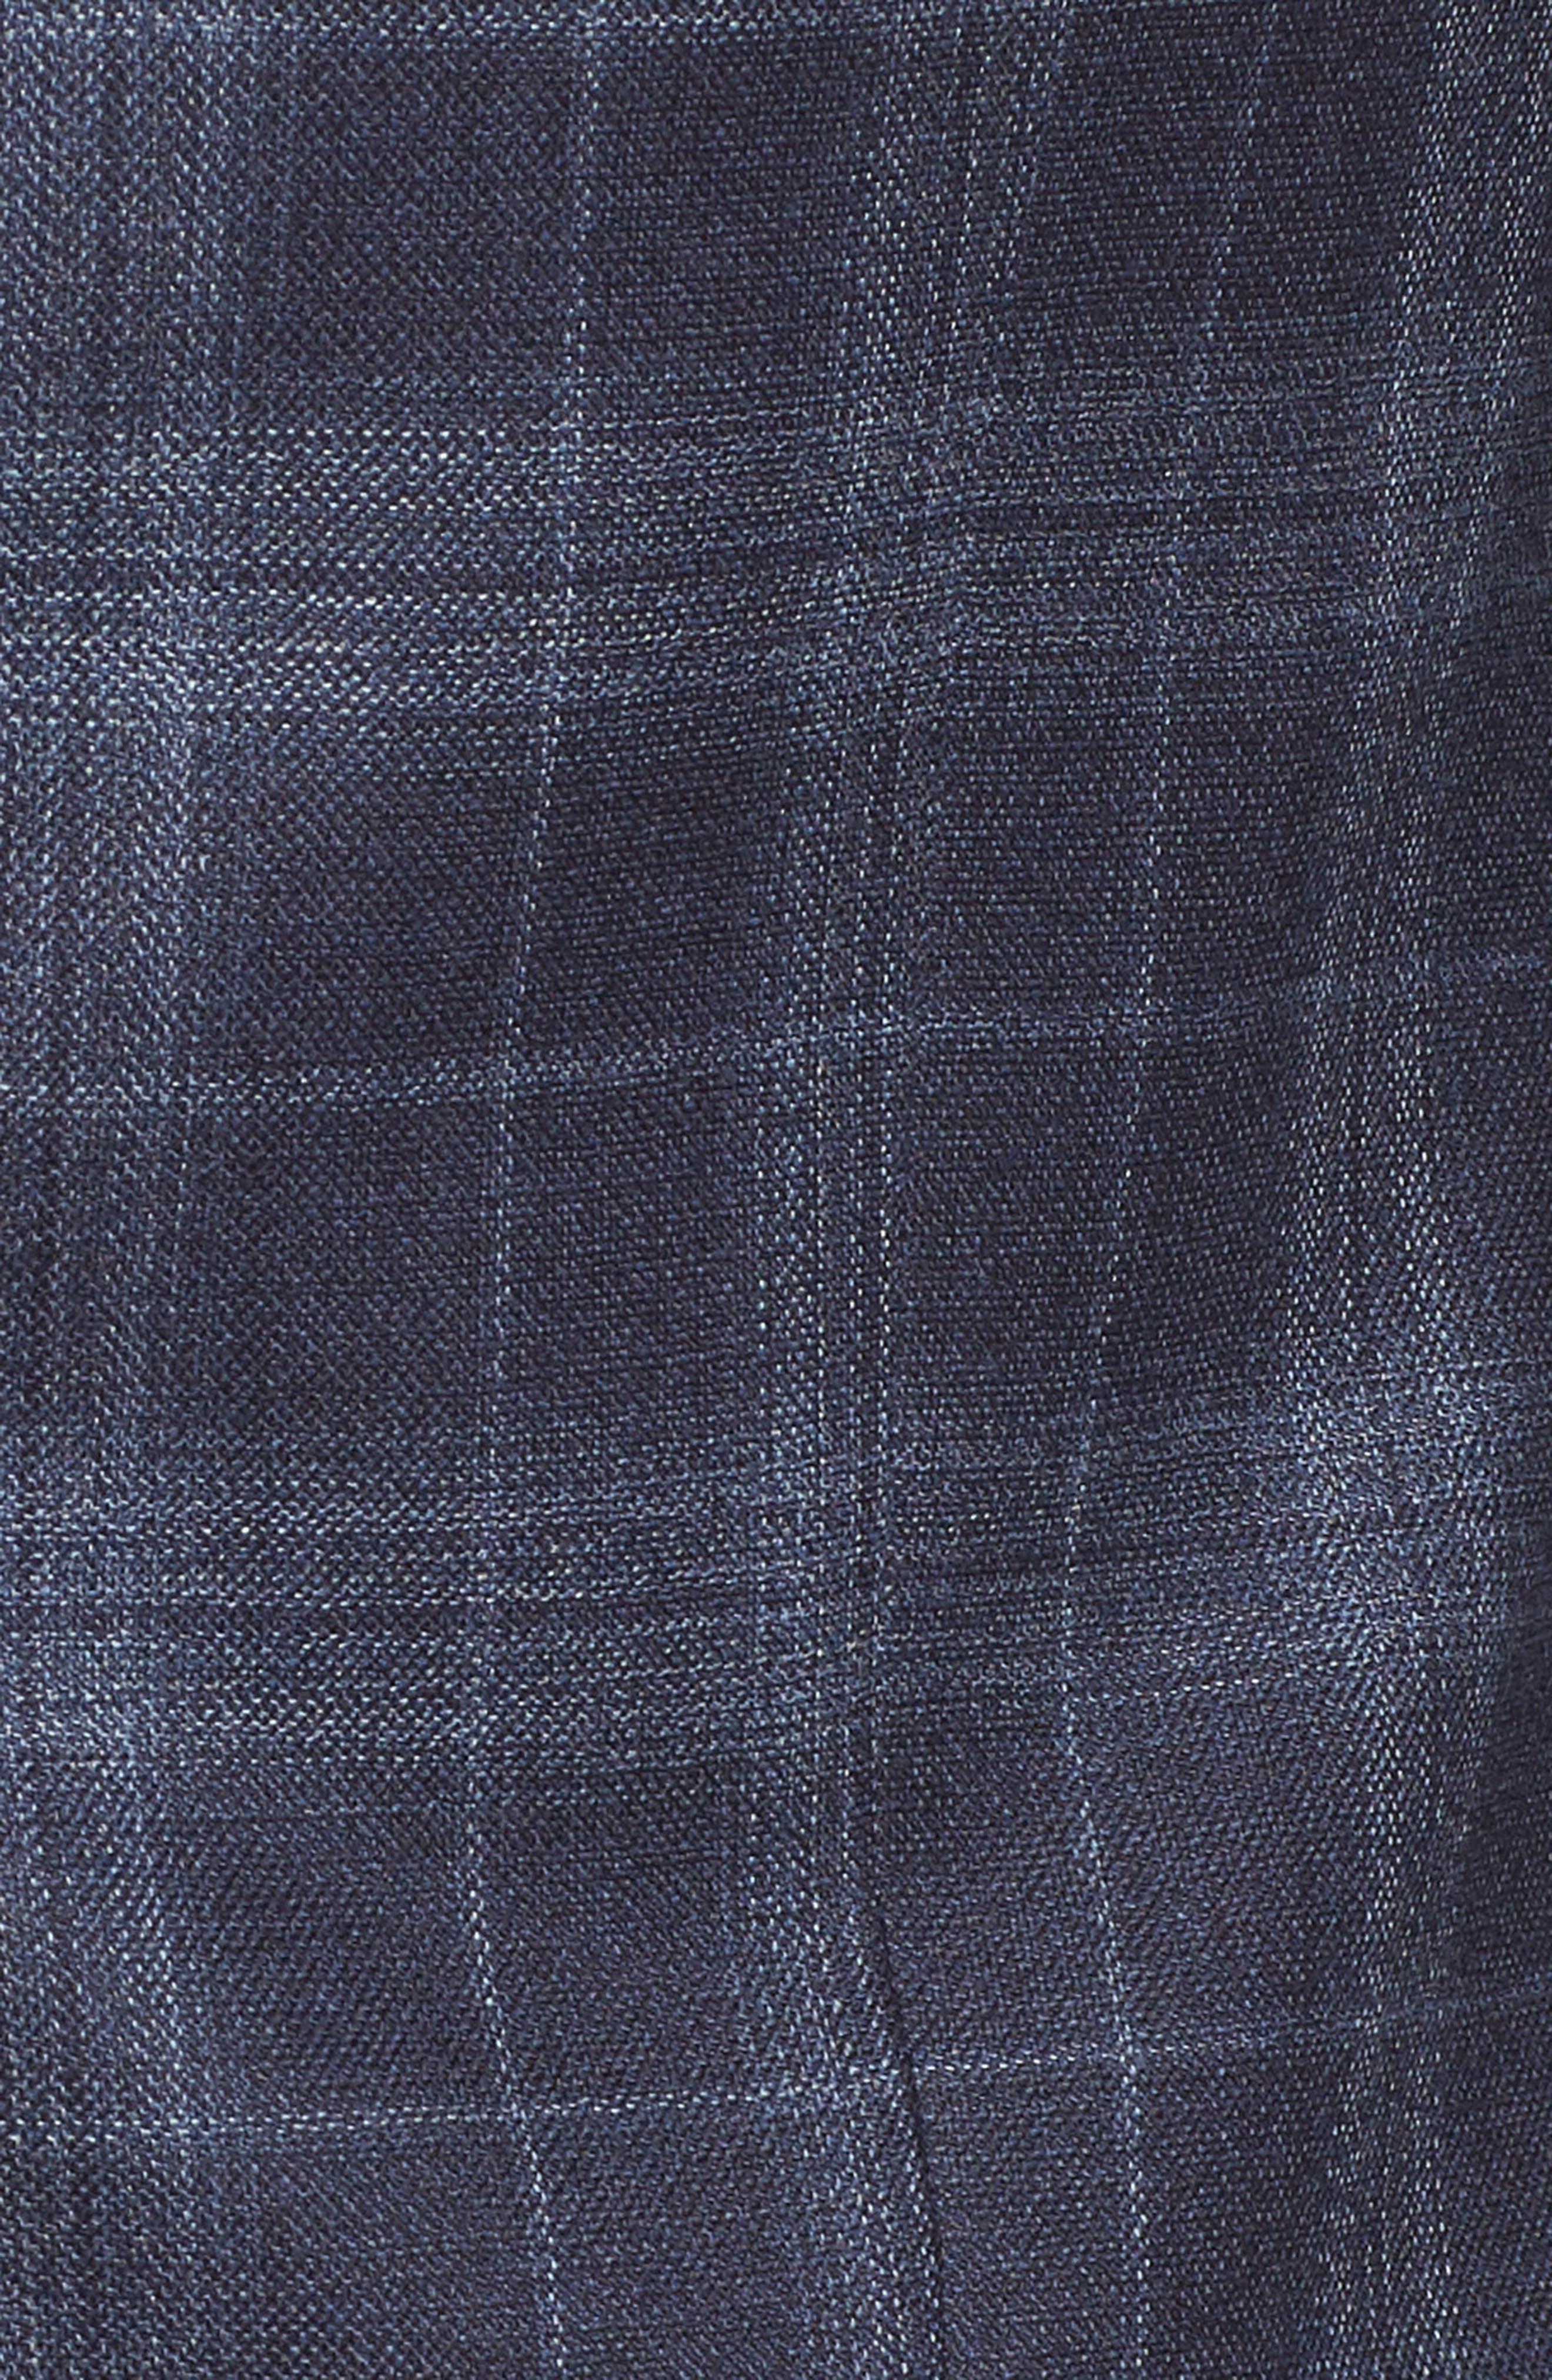 Classic Fit Plaid Wool & Silk Sport Coat,                             Alternate thumbnail 6, color,                             NAVY